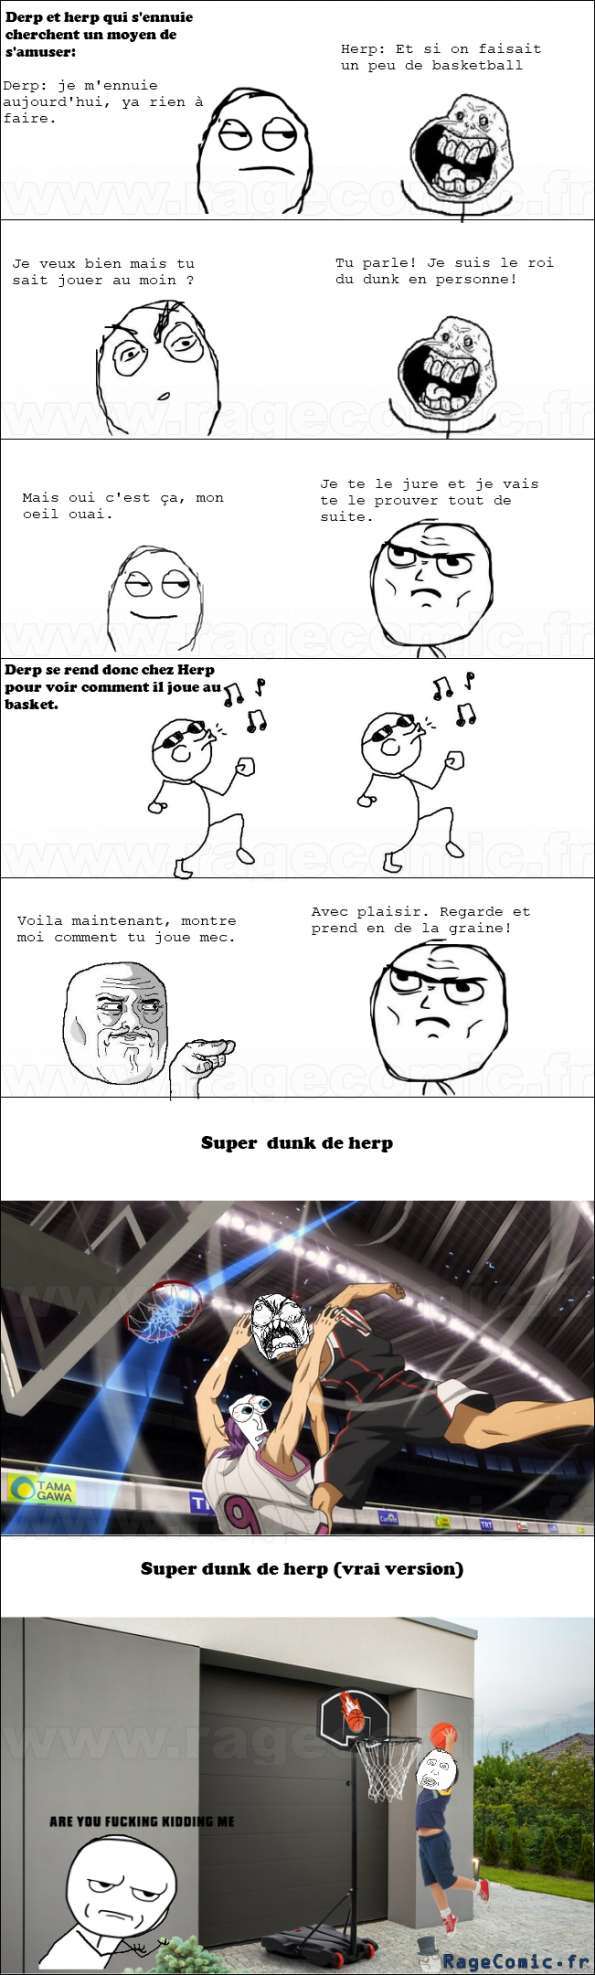 super dunk